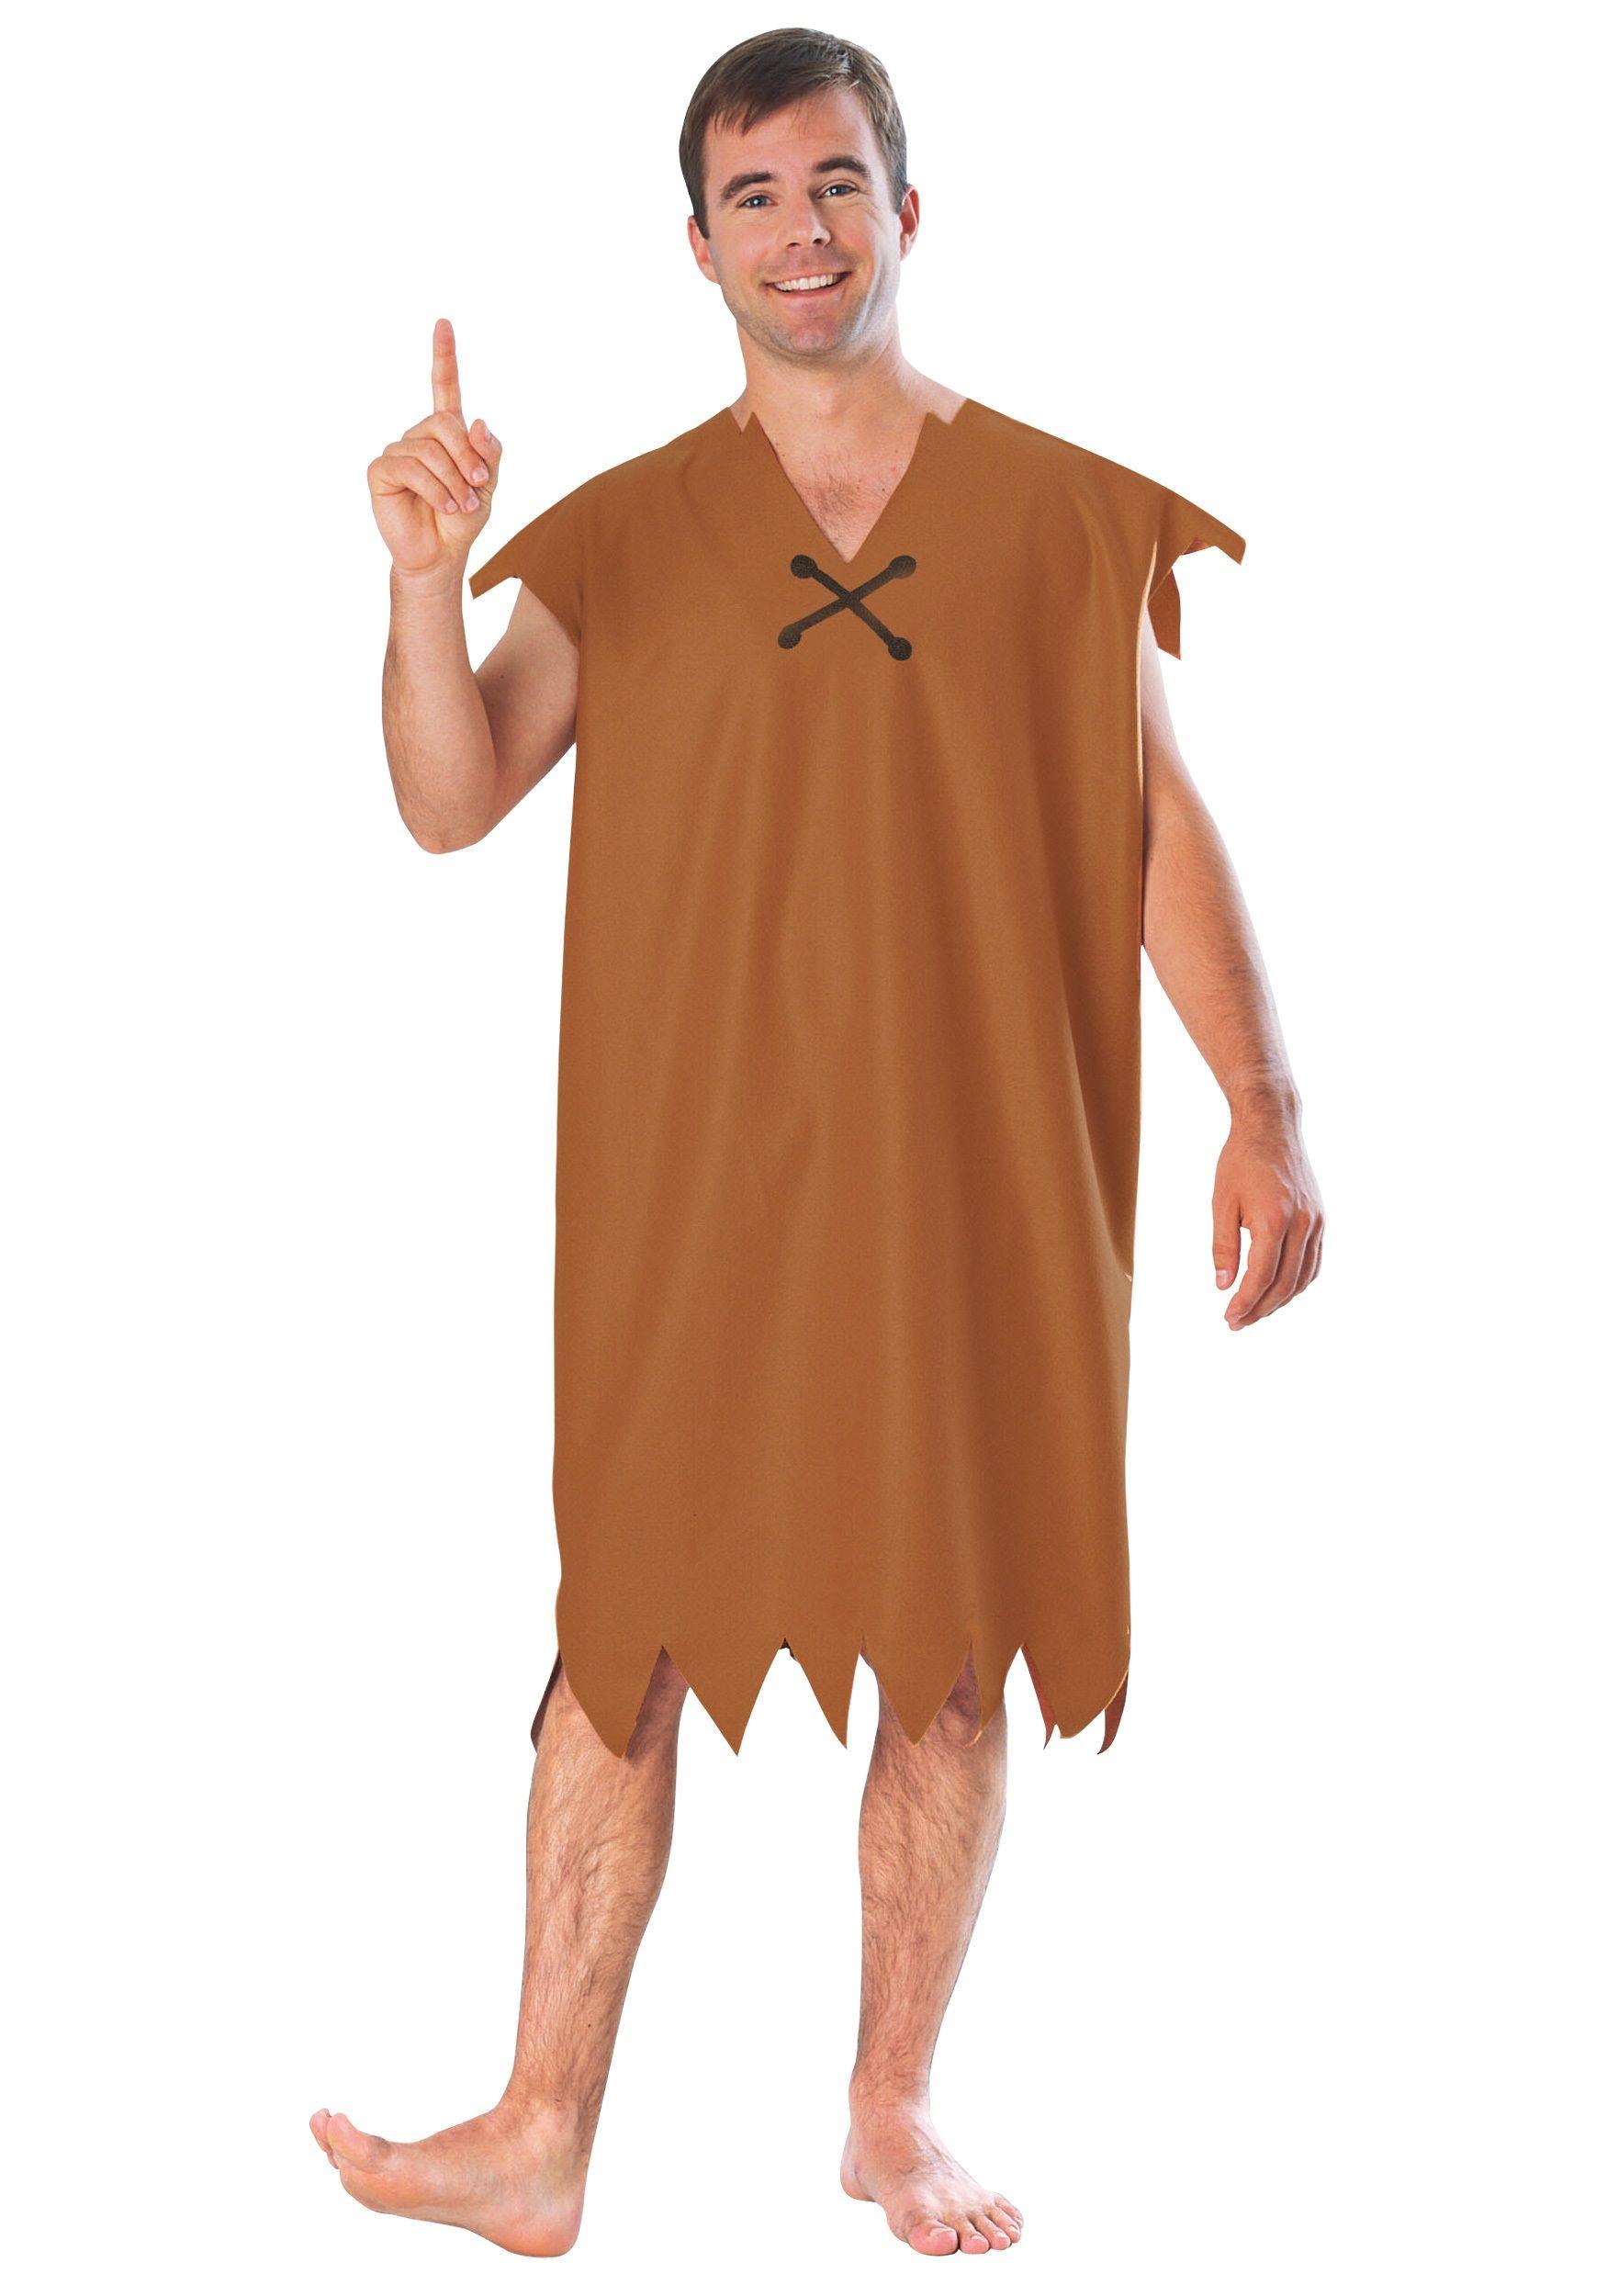 Barney Rubble Adult Costume - Adult Flintstones Costumes  sc 1 st  Pinterest & Barney Rubble Adult Costume - Adult Flintstones Costumes | Costume ...